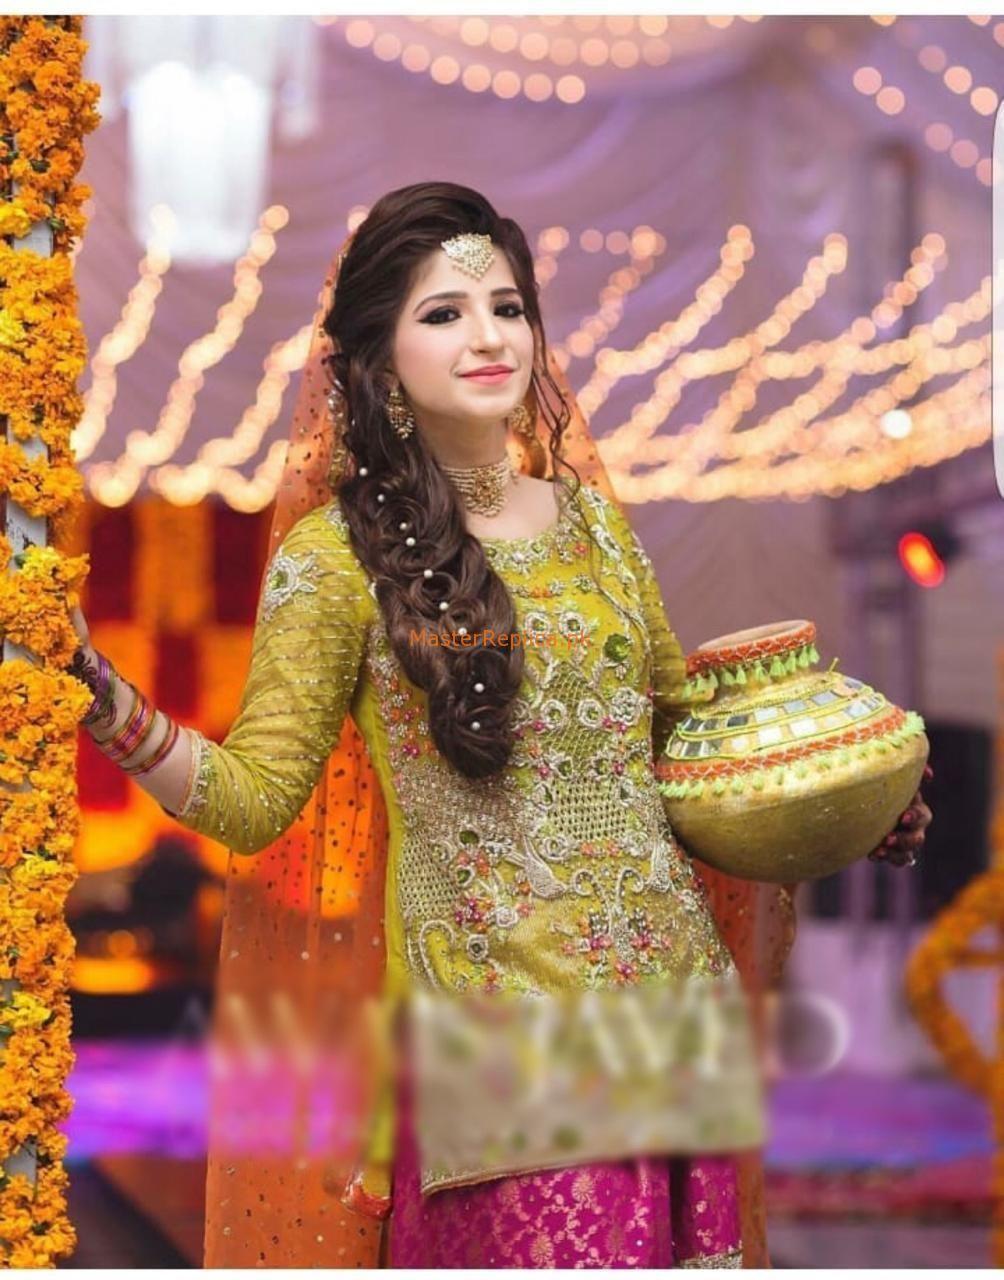 Kashee S Bridal Chiffon Master Replica In 2020 Bridal Dress Design Pakistani Bridal Dresses Pakistani Wedding Outfits